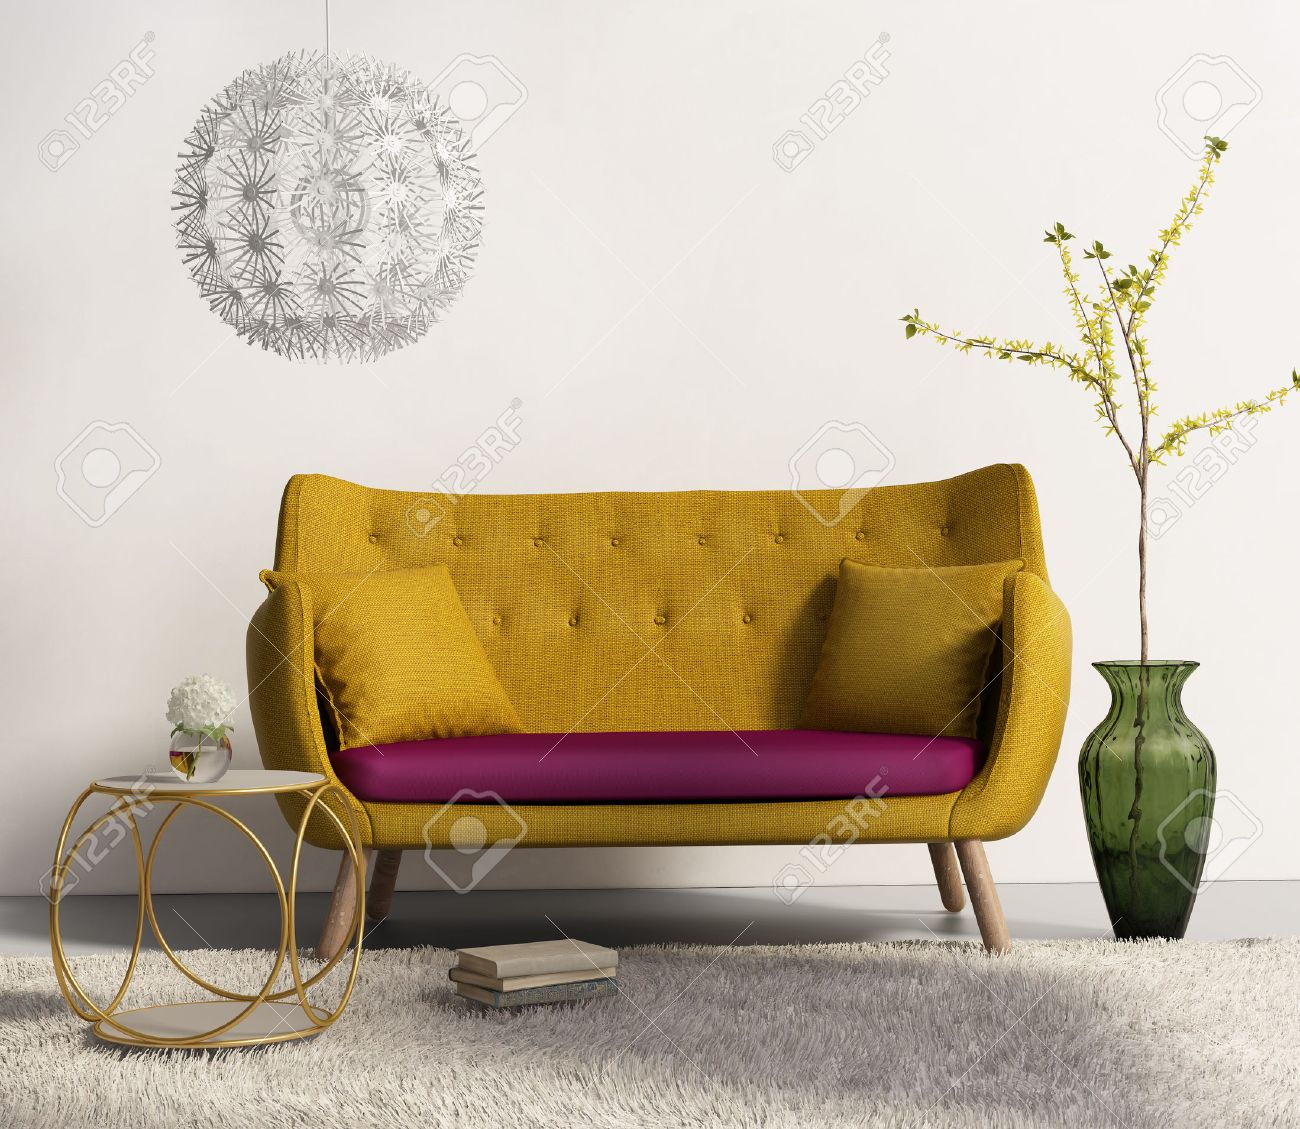 Gele bank in fris interieur woonkamer royalty vrije foto, plaatjes ...